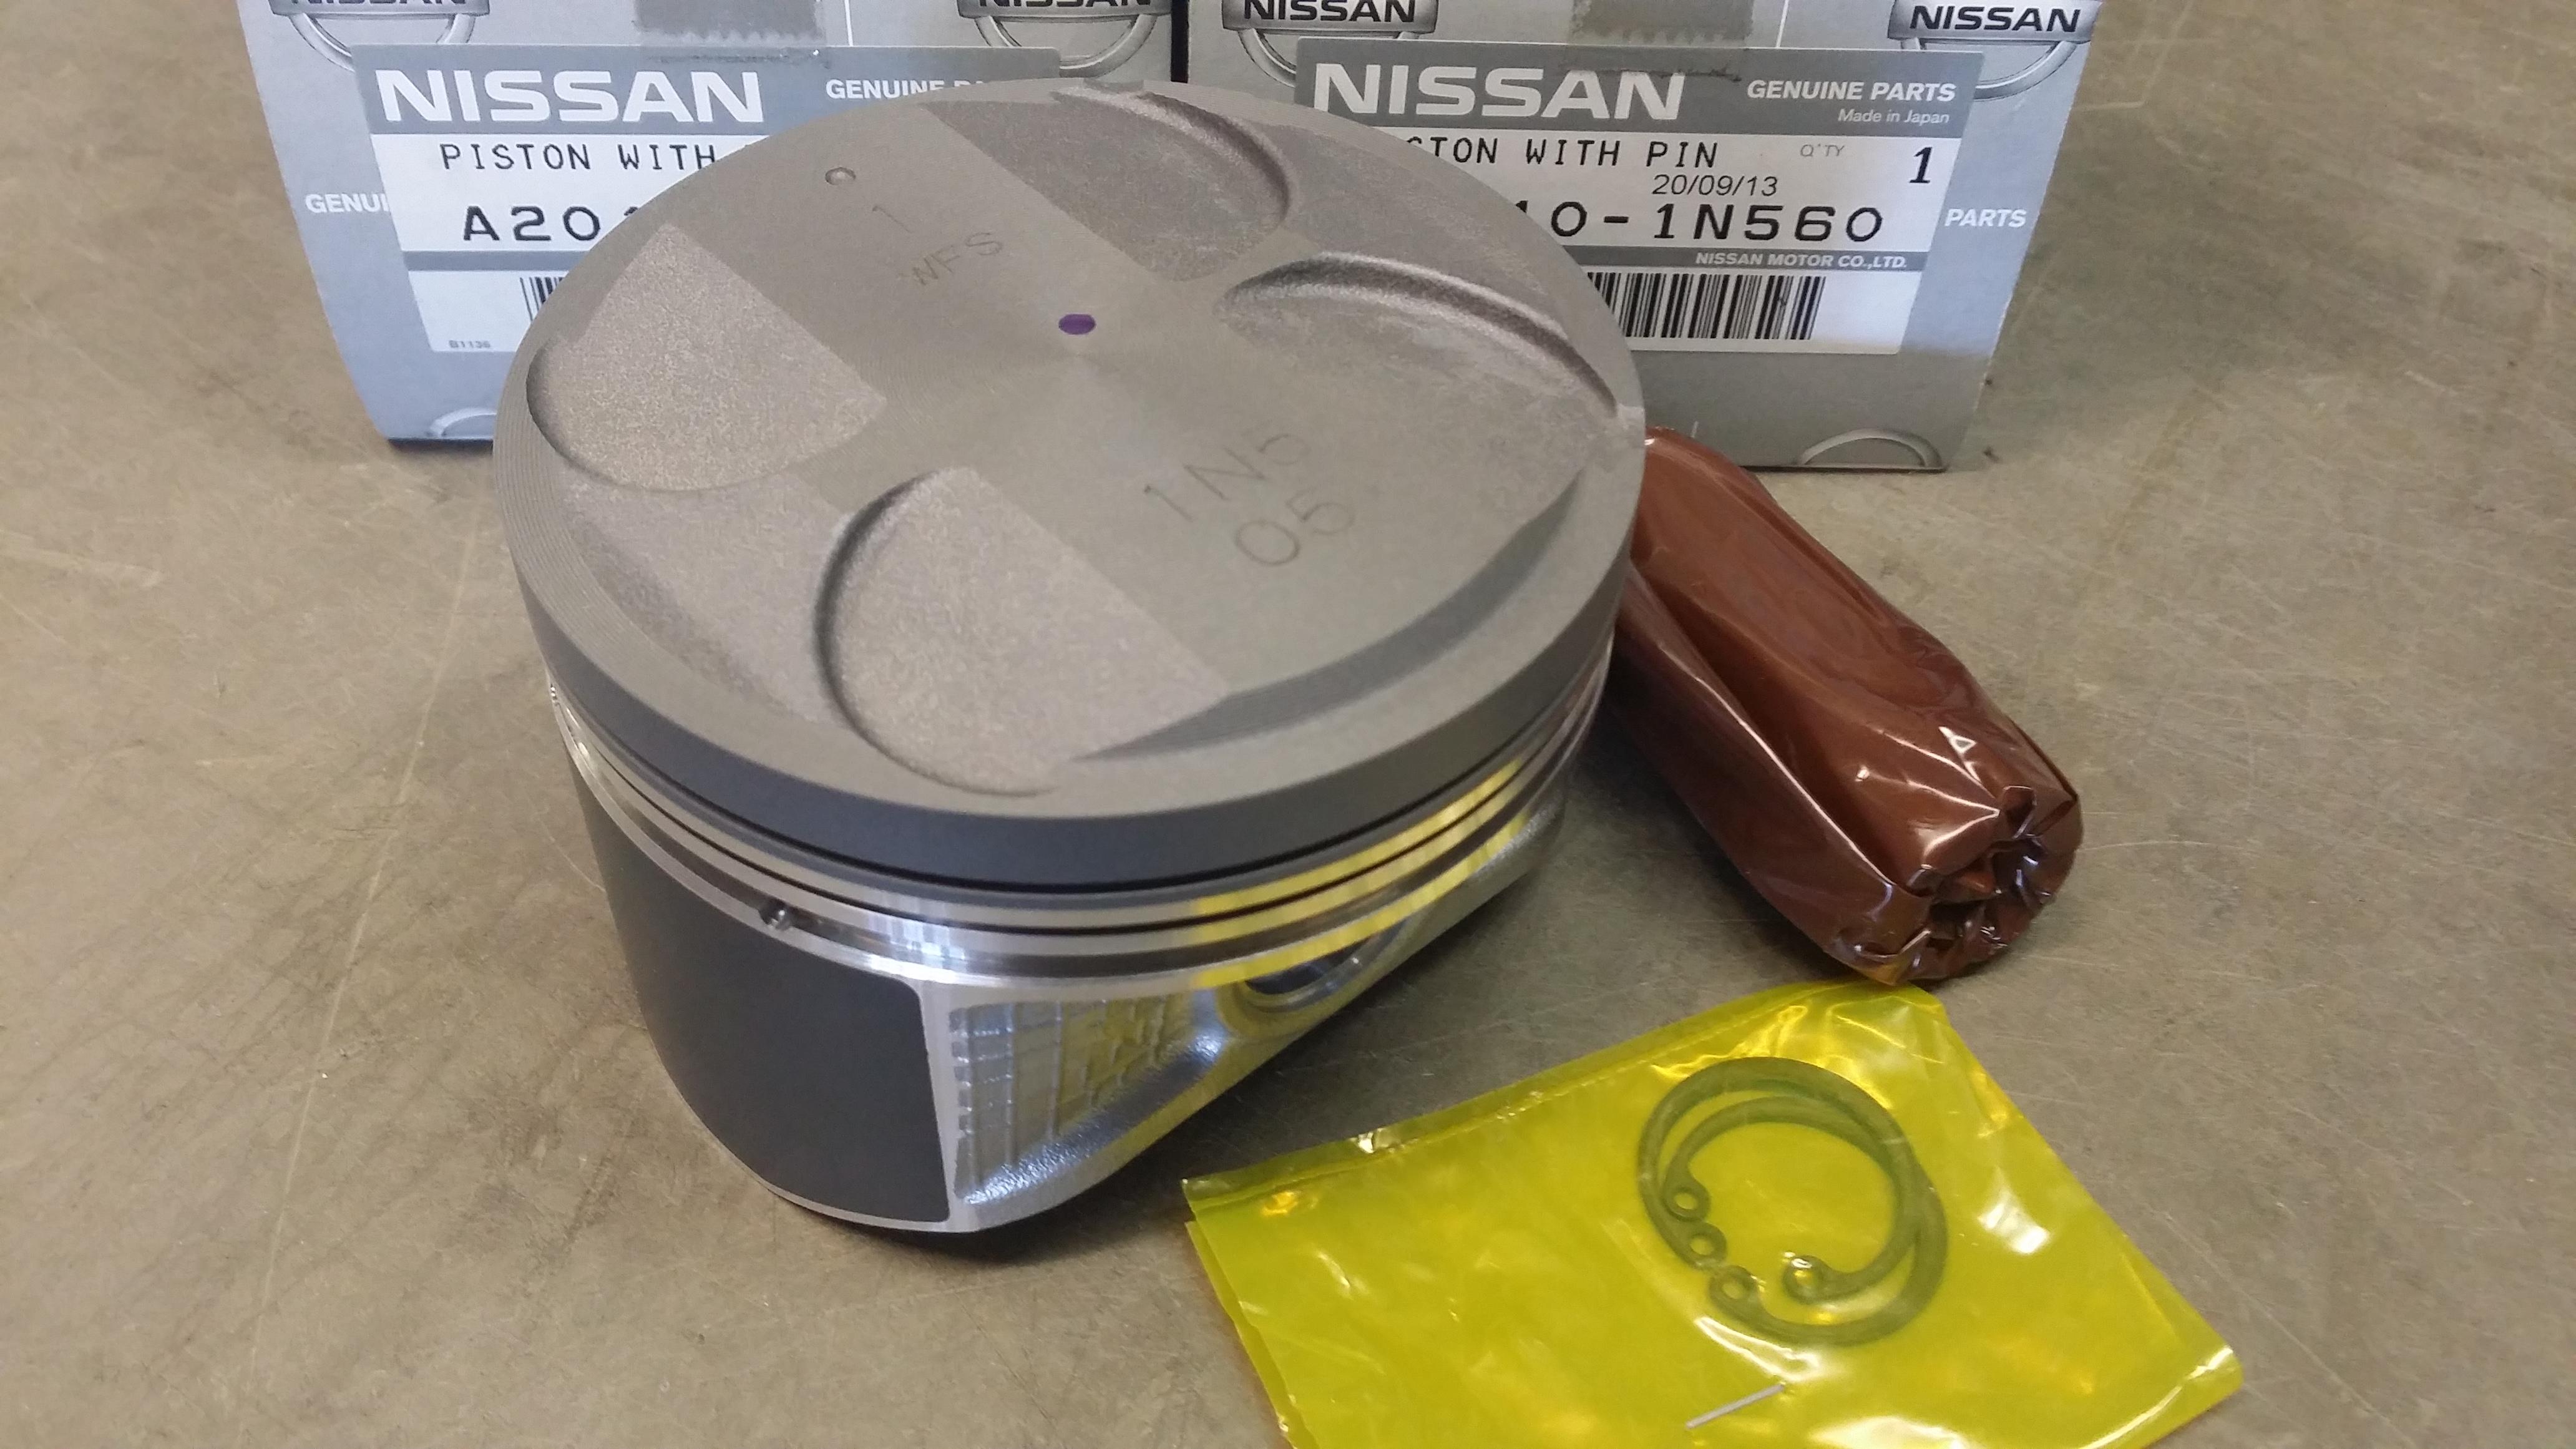 Nismo High Compression Piston 86mm Sr20de T A2010 1n560